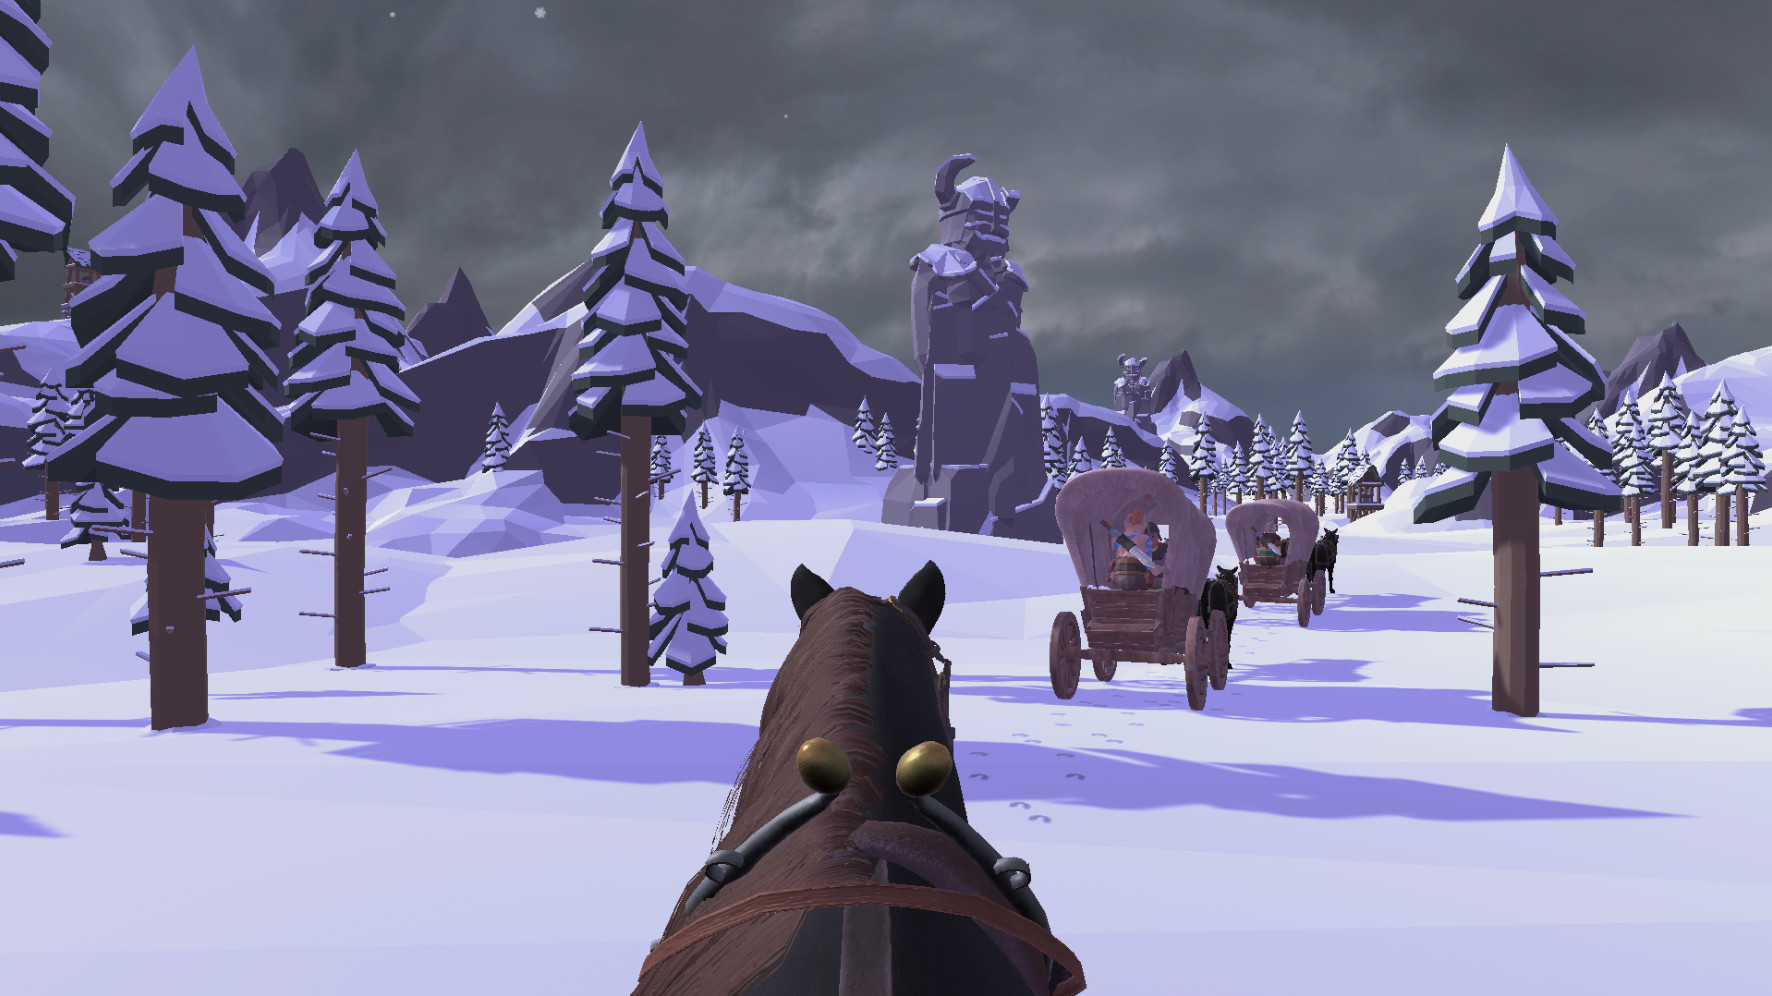 Mighty Vikings screenshot